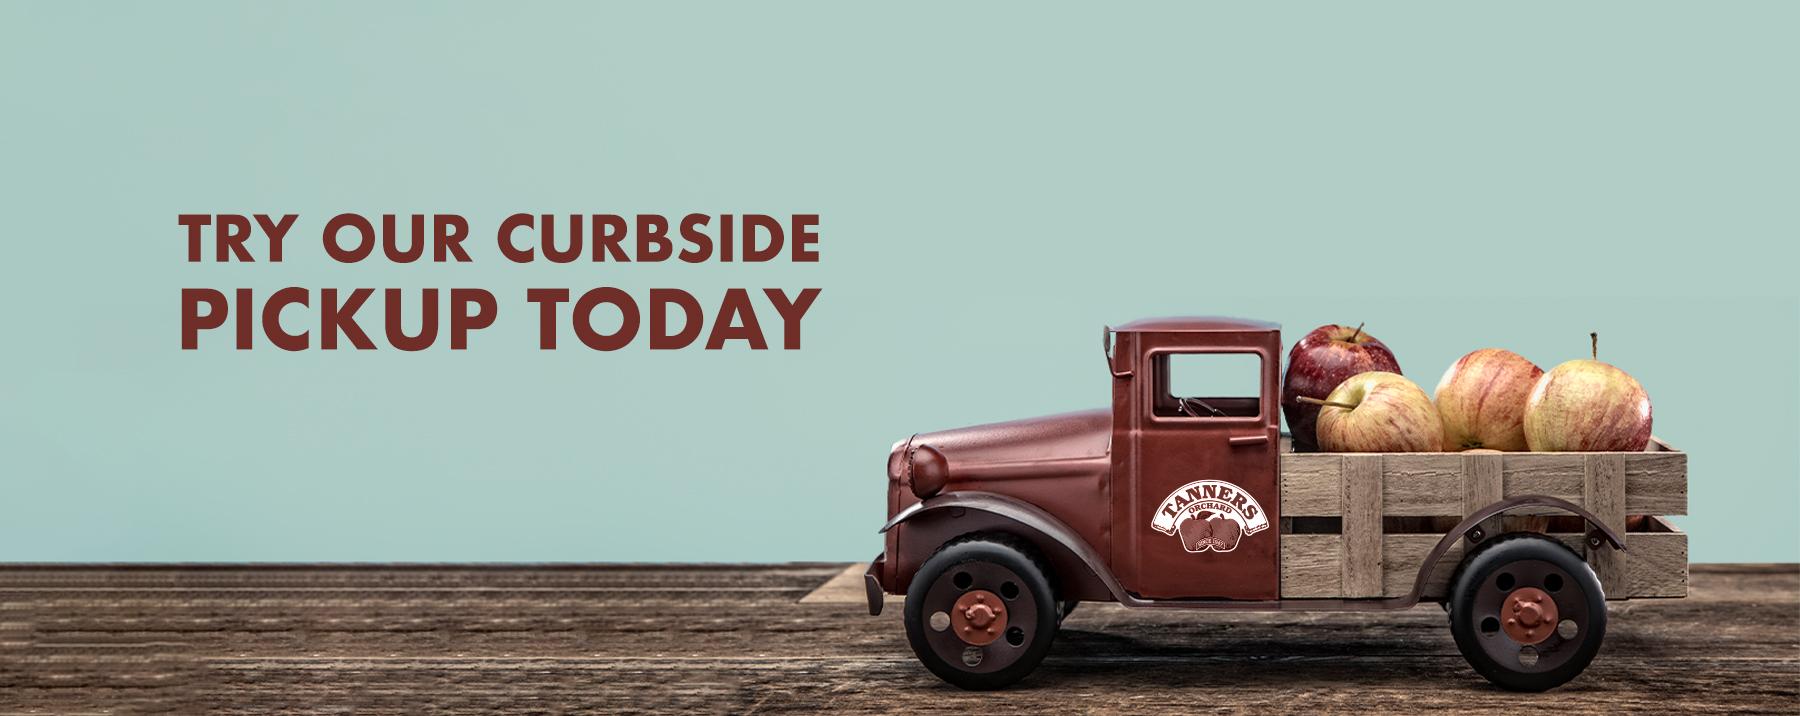 Curbside Pickup Slider